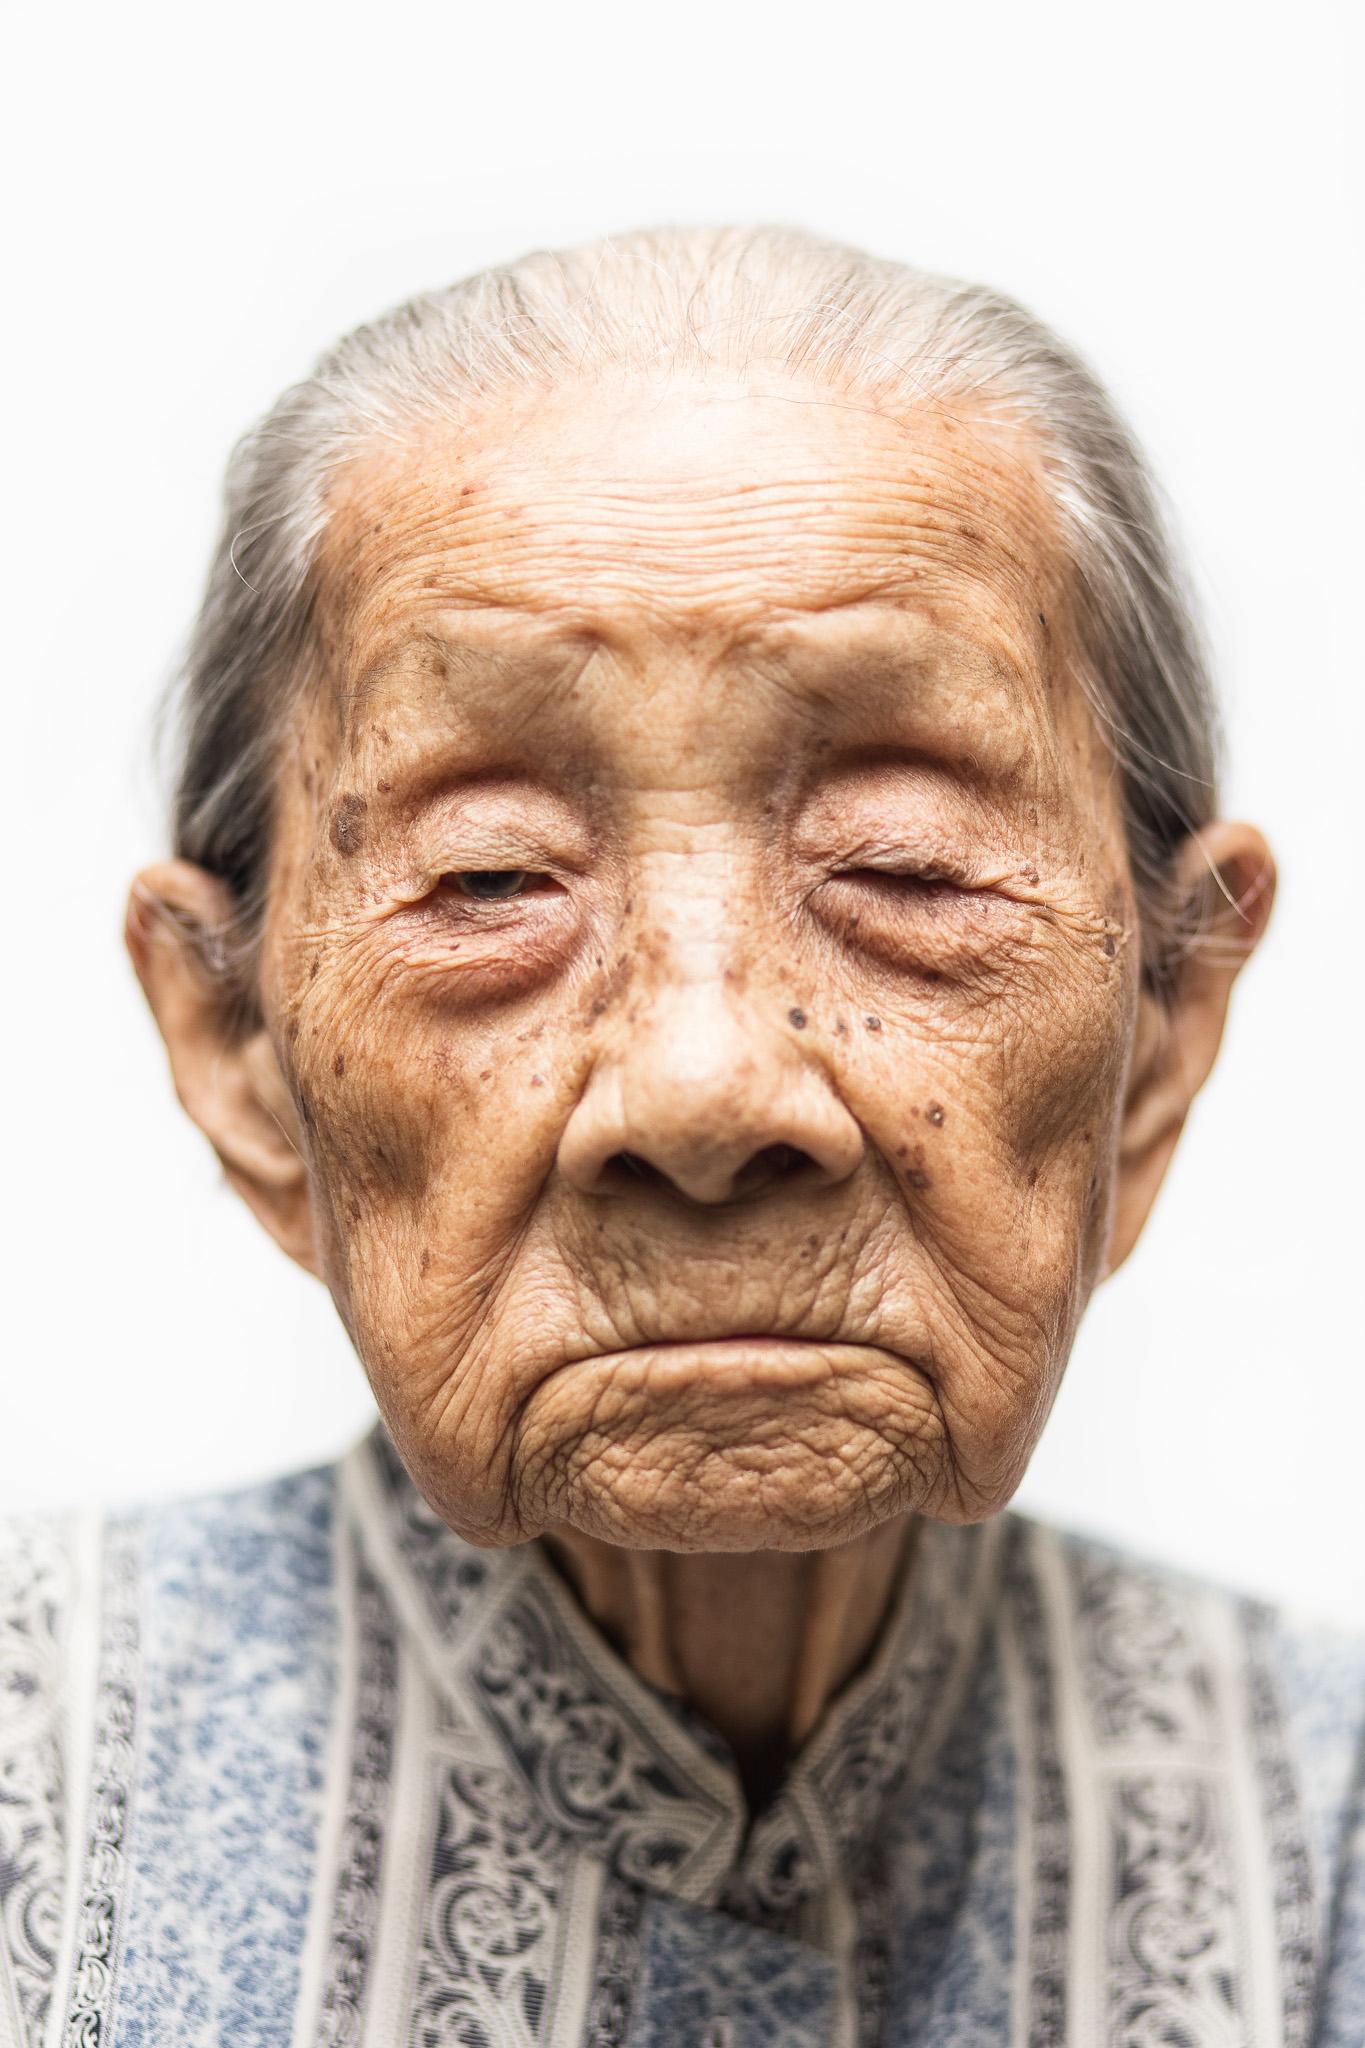 zainal-zainal-studio-centenarians-care-duke-nus-singapore-photographer-13.jpg